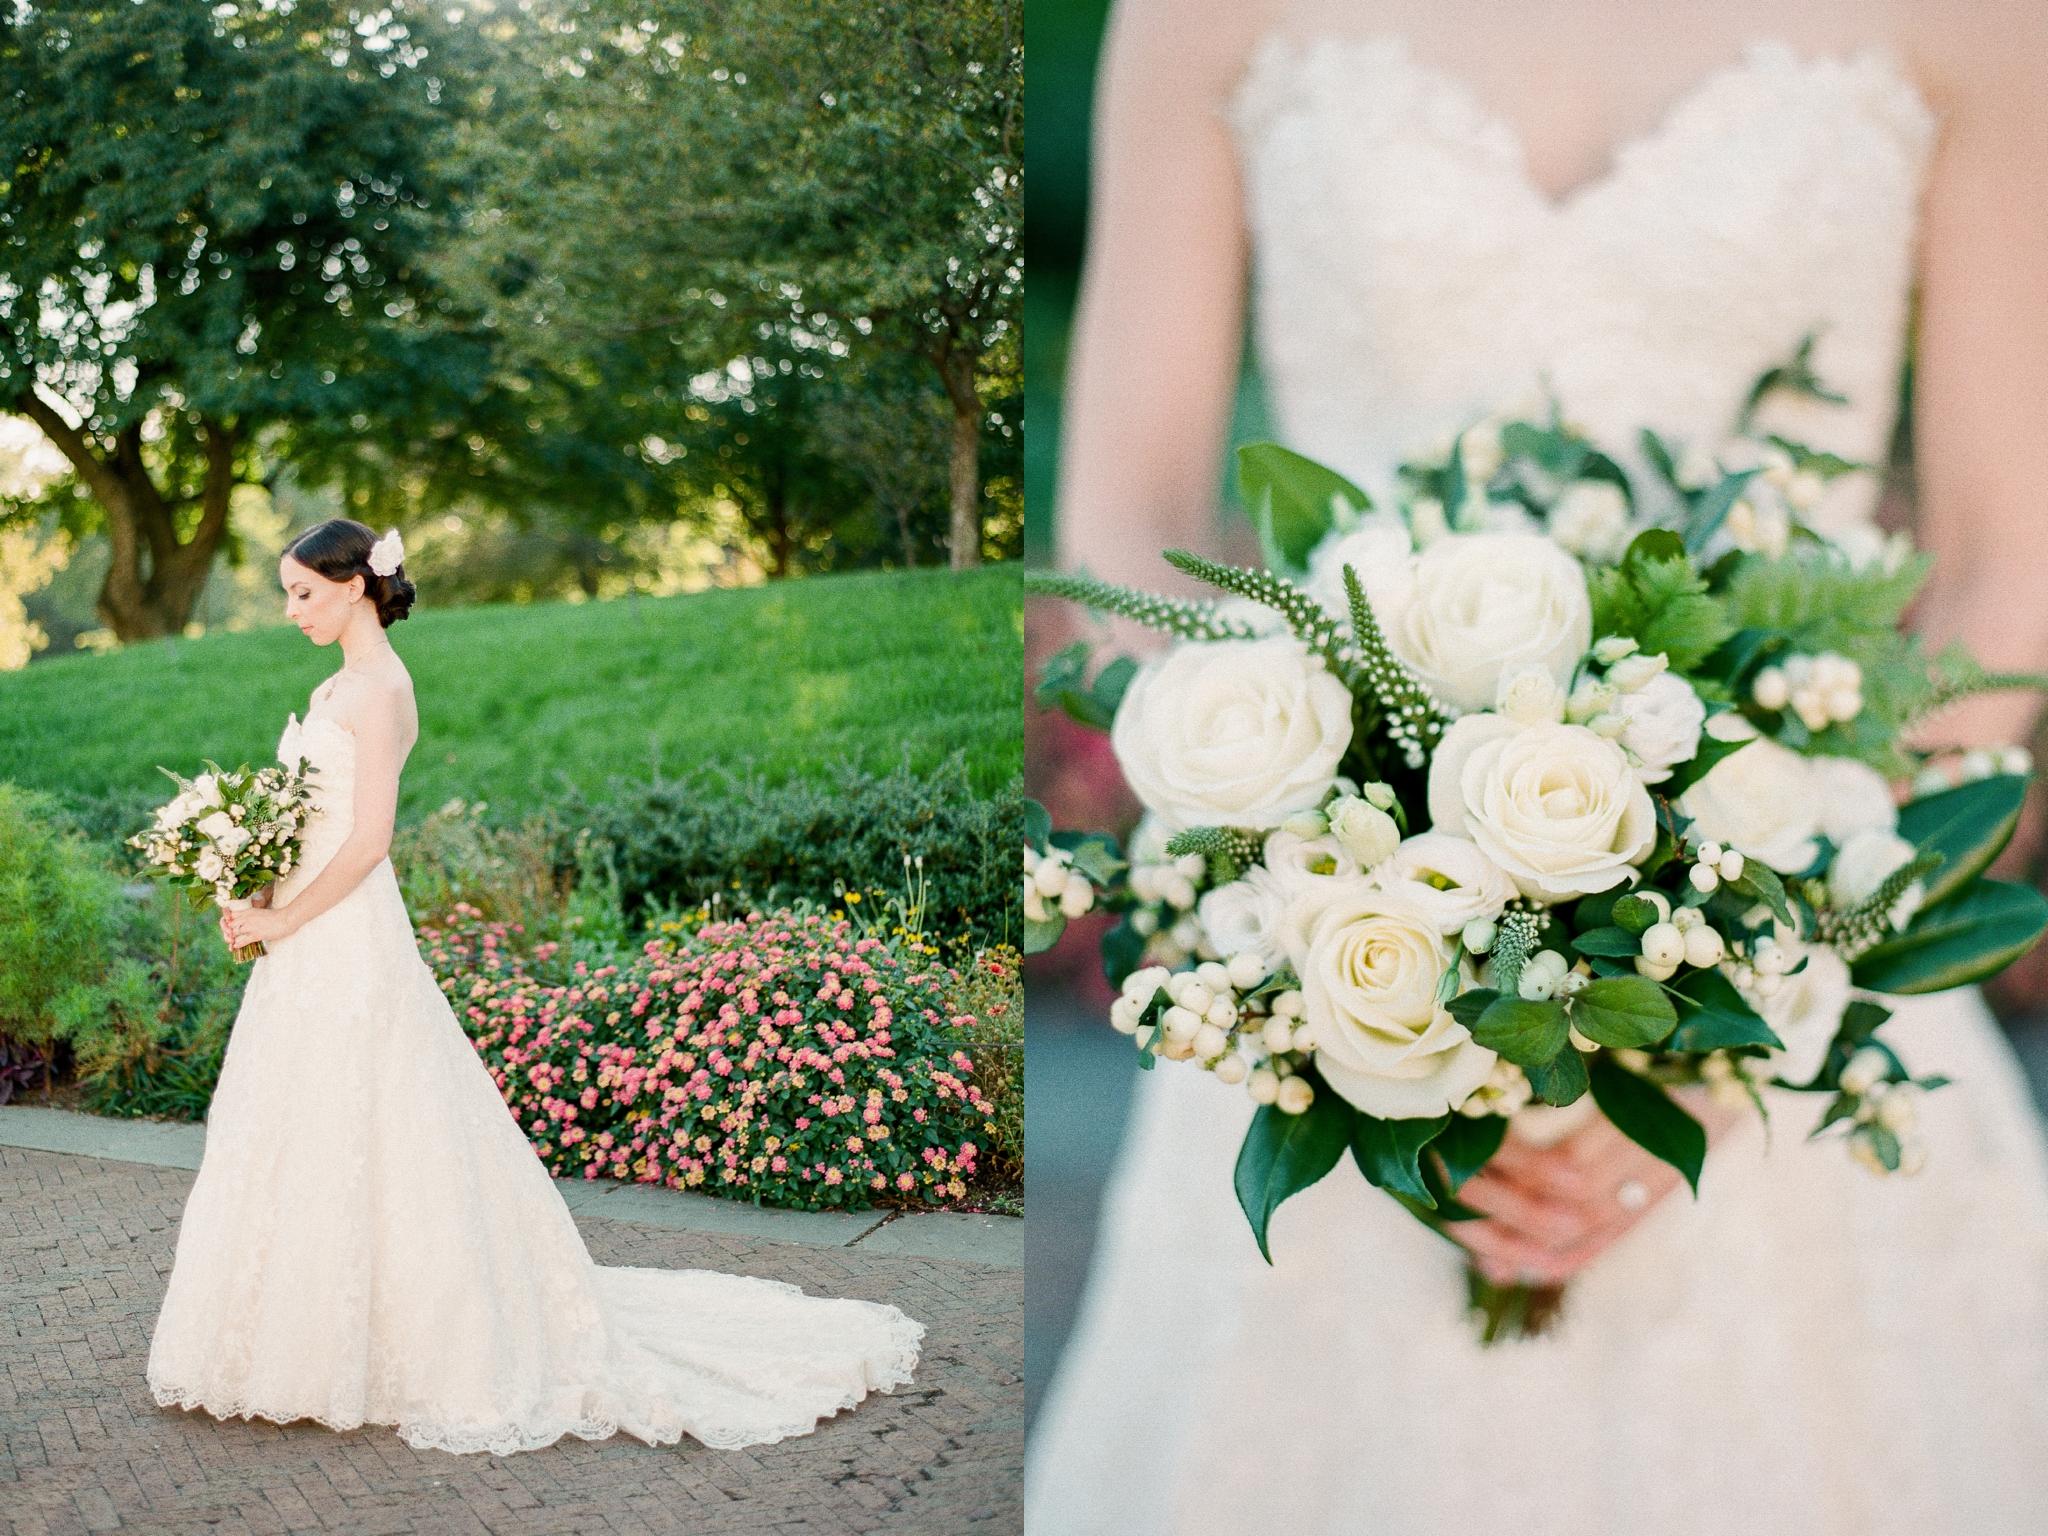 Brooklyn-Botanic-Garden-Wedding-Photos-The-Palm-House-05.JPG